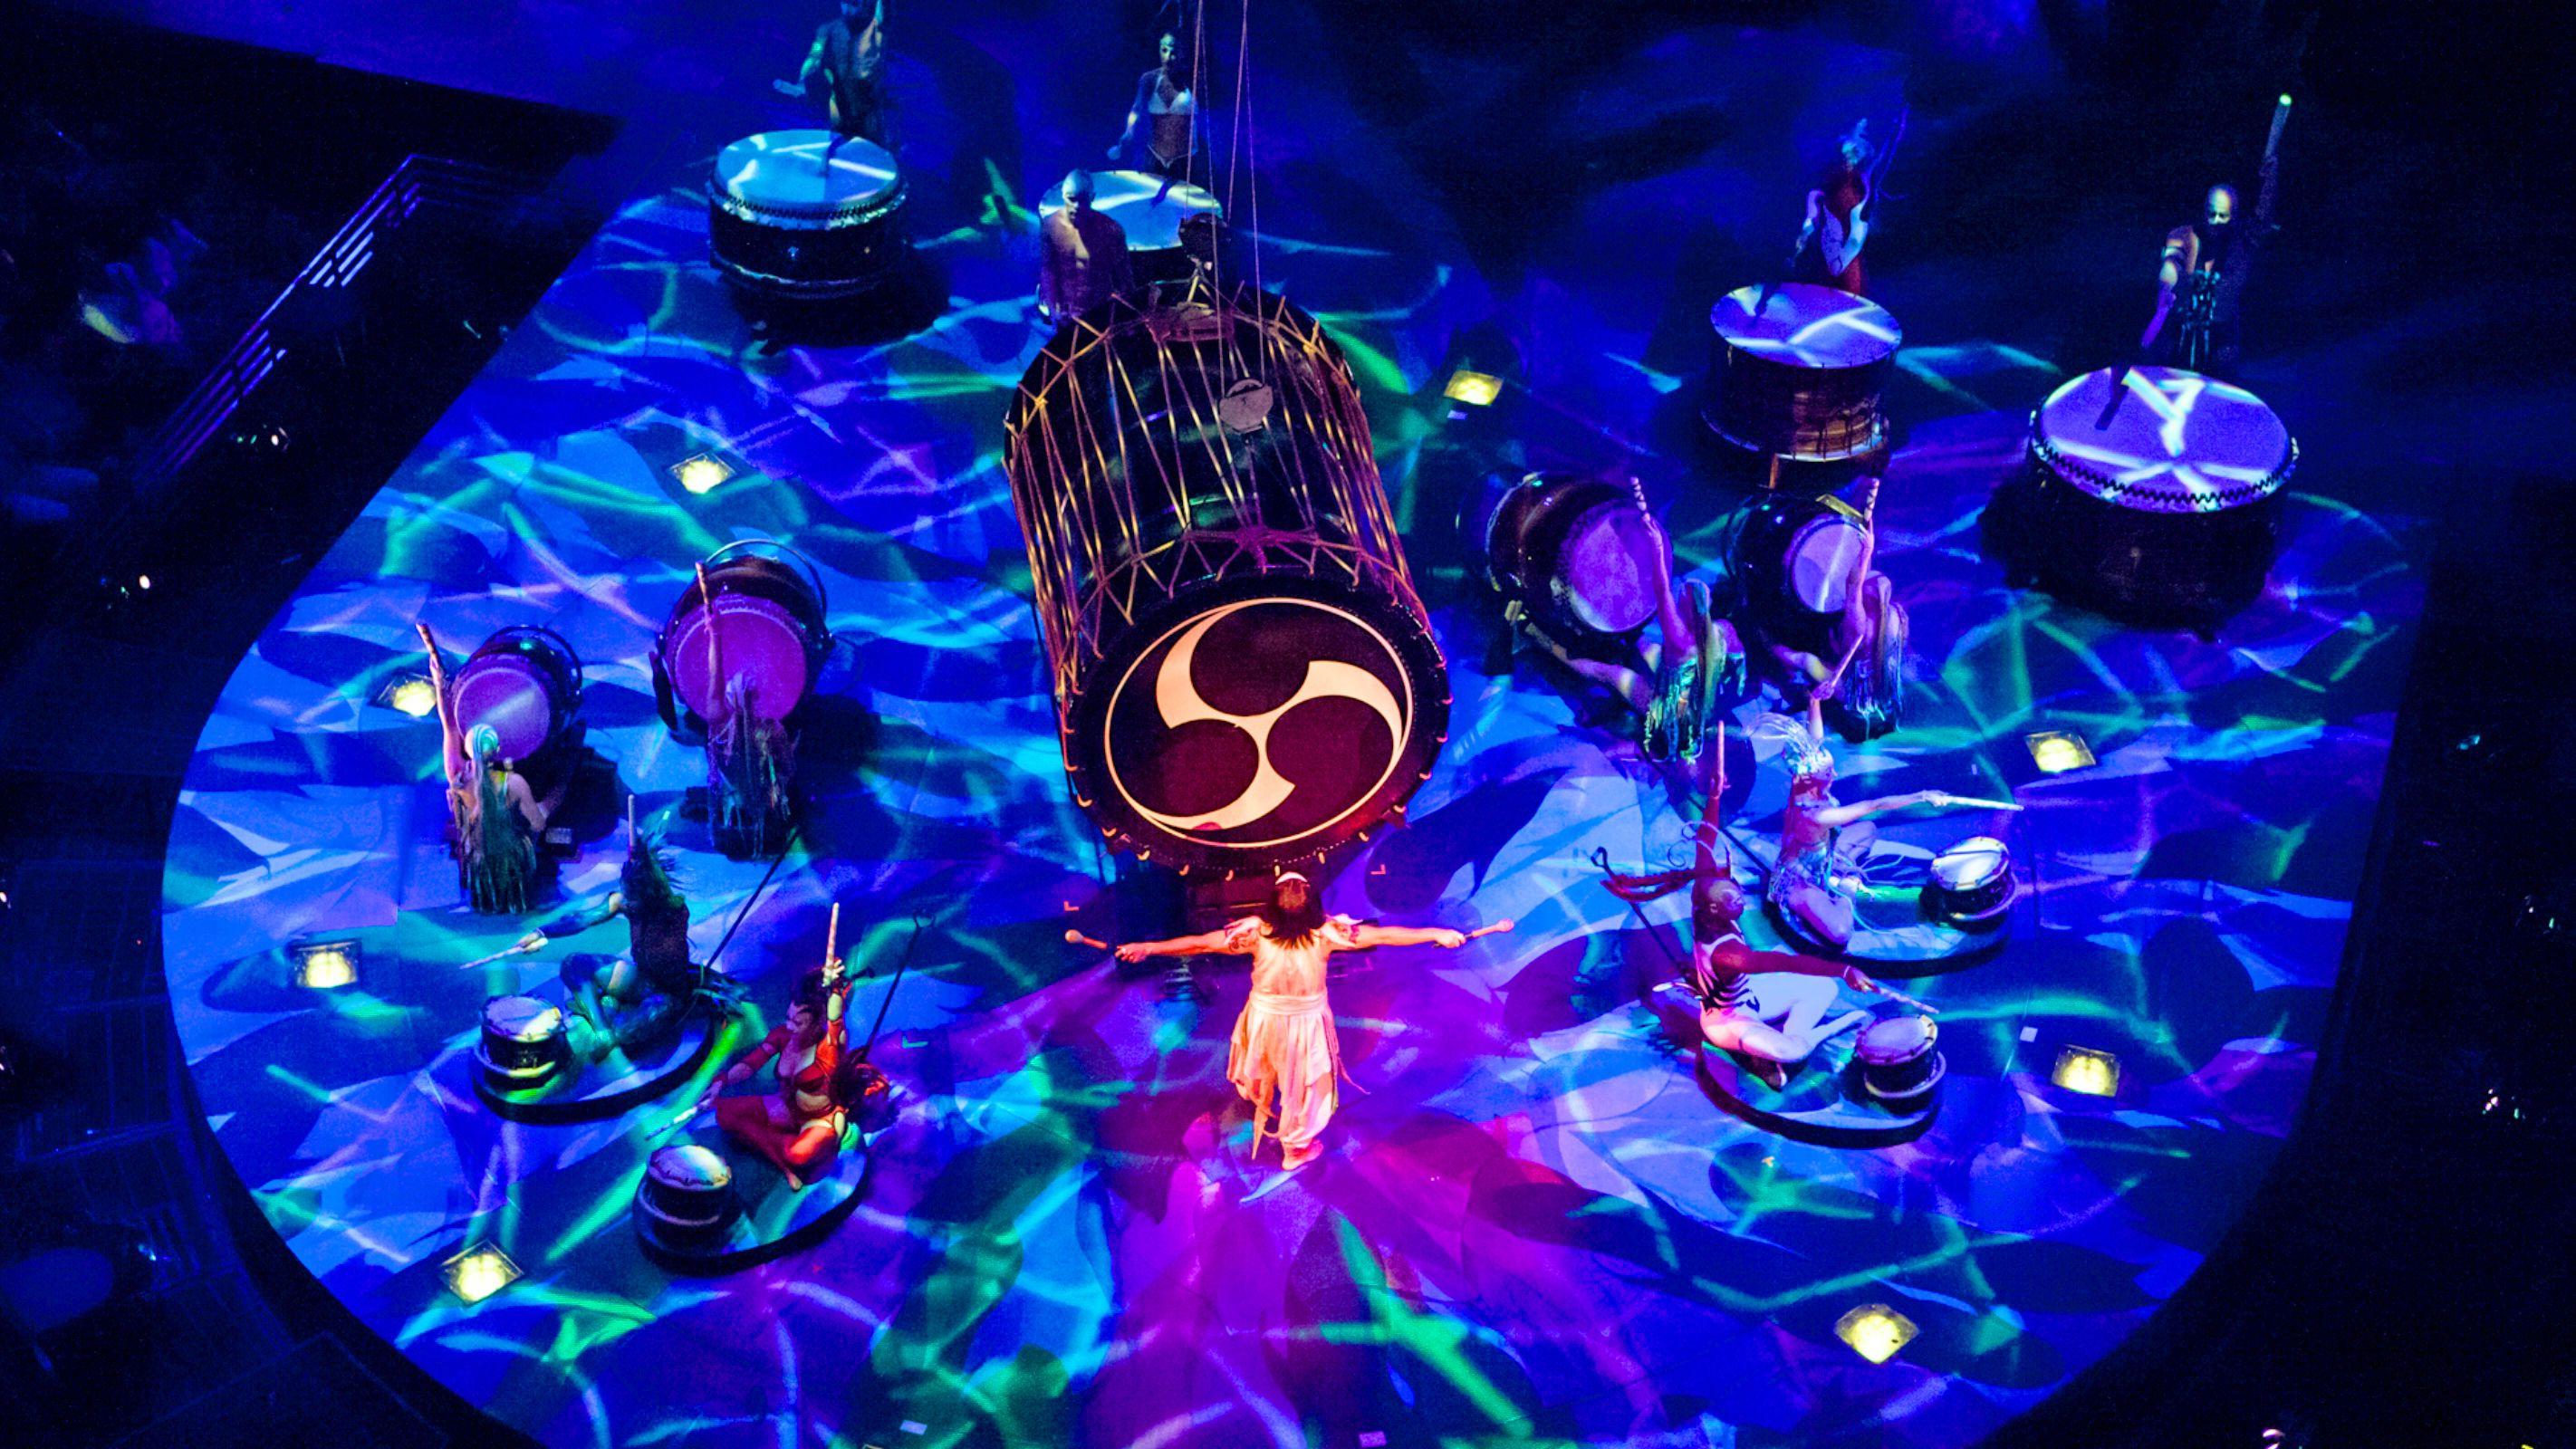 Aerial view of Cirque Du Soleil show